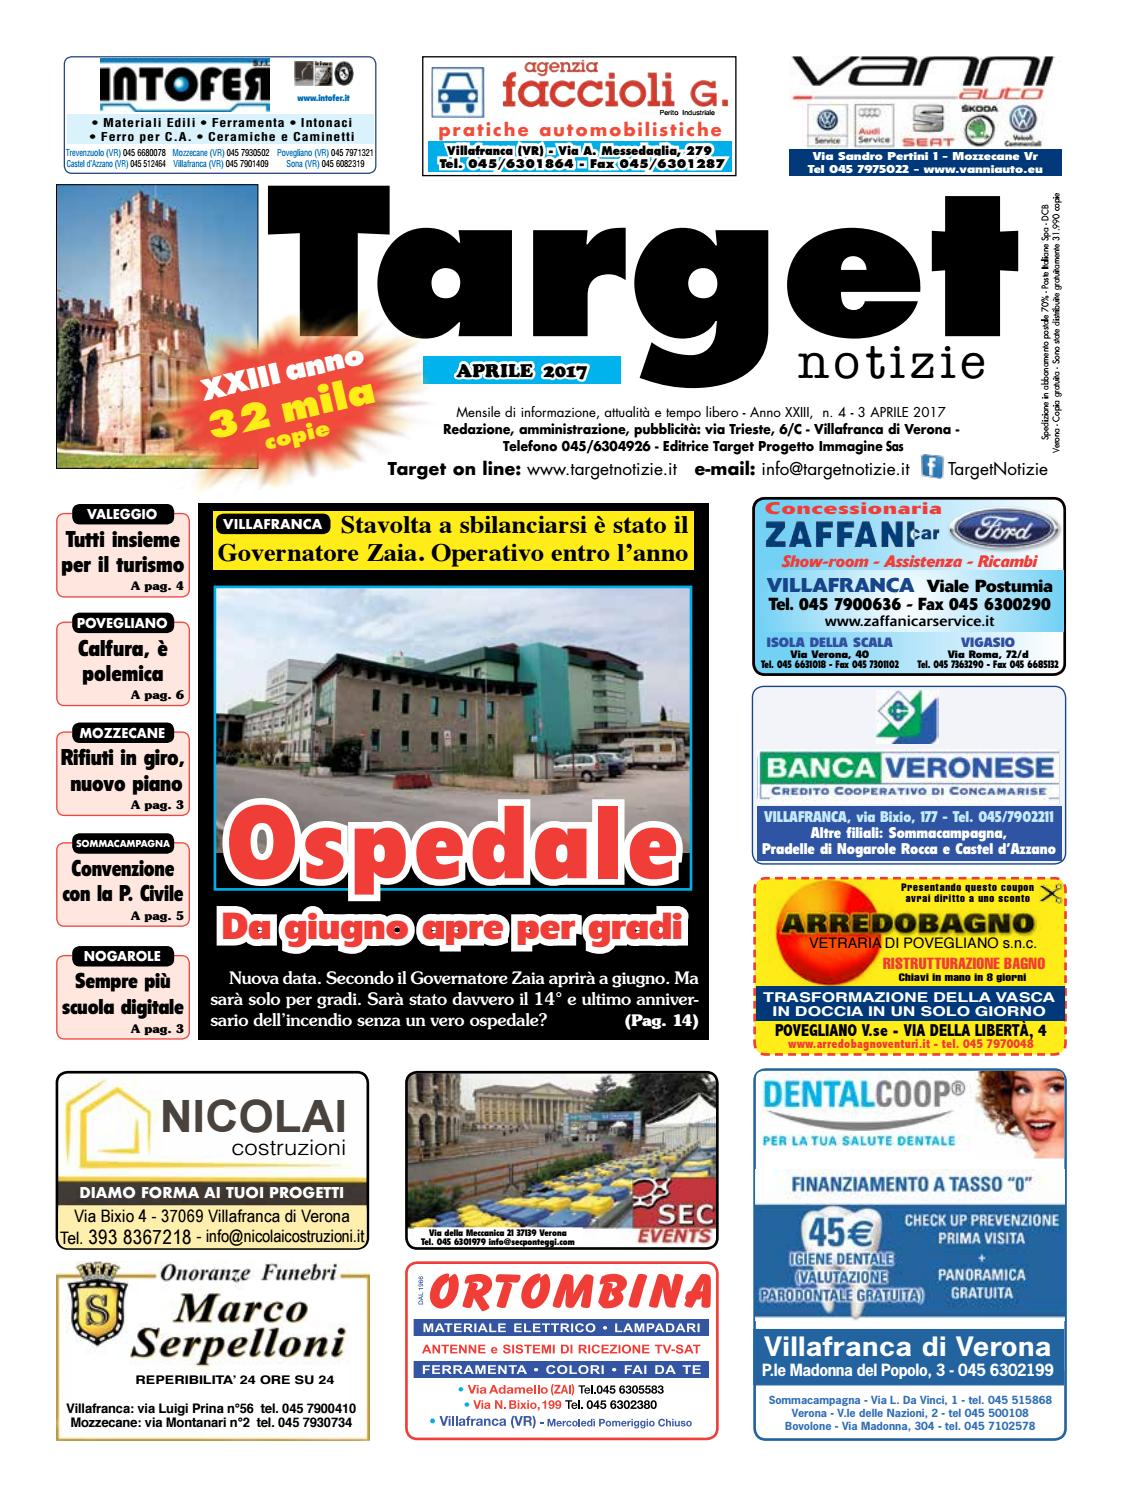 targetnotizie 04 aprile 2017 by ischarlie - issuu - Arredo Bagno Povegliano